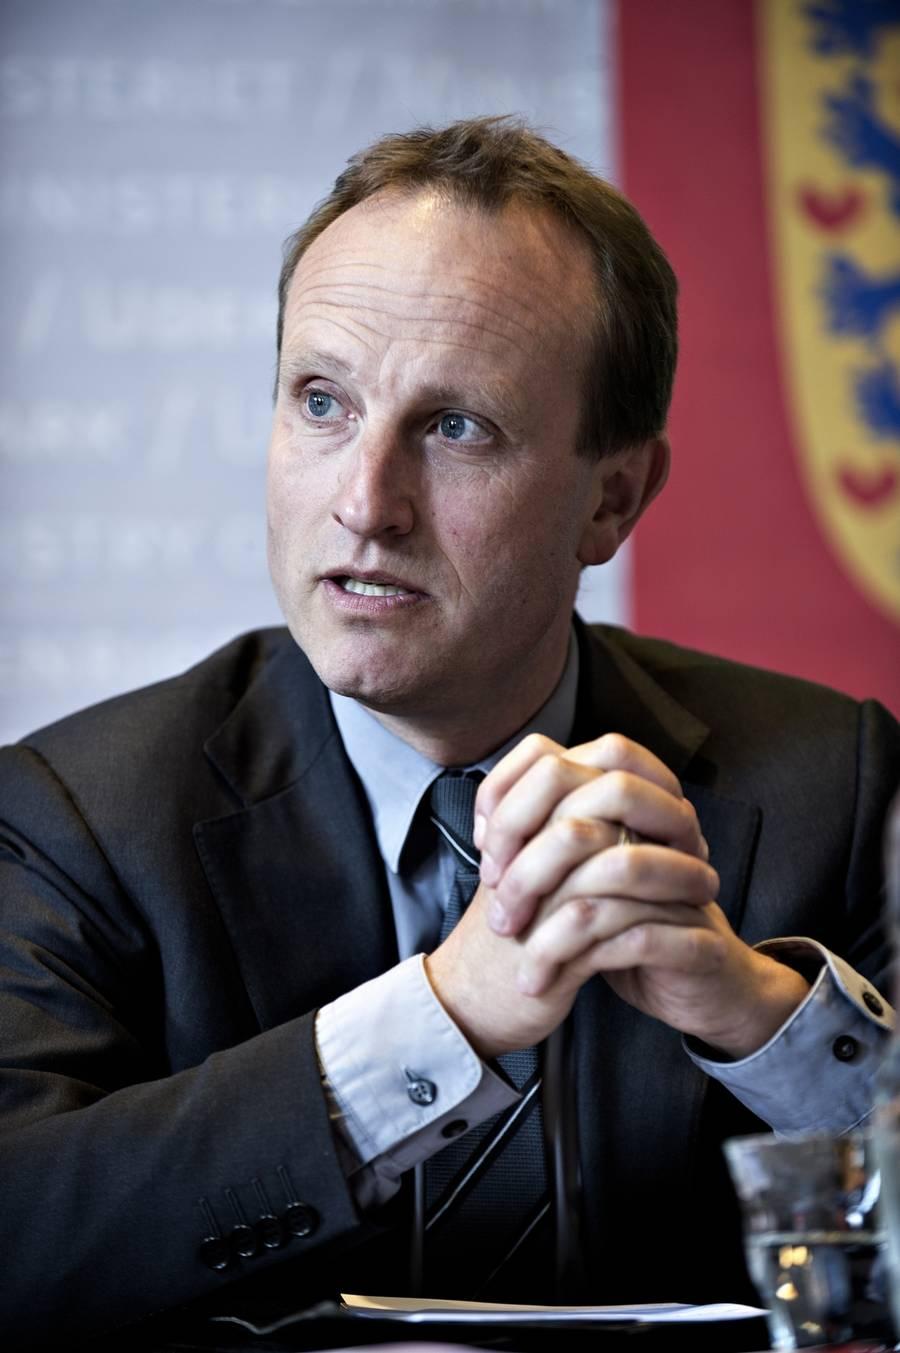 Formanden for Dansk Solcelleforening, Signe Antvorskov Krag, giver en sviner til klima- og energiministeren. (Polfoto/Anita Graversen)